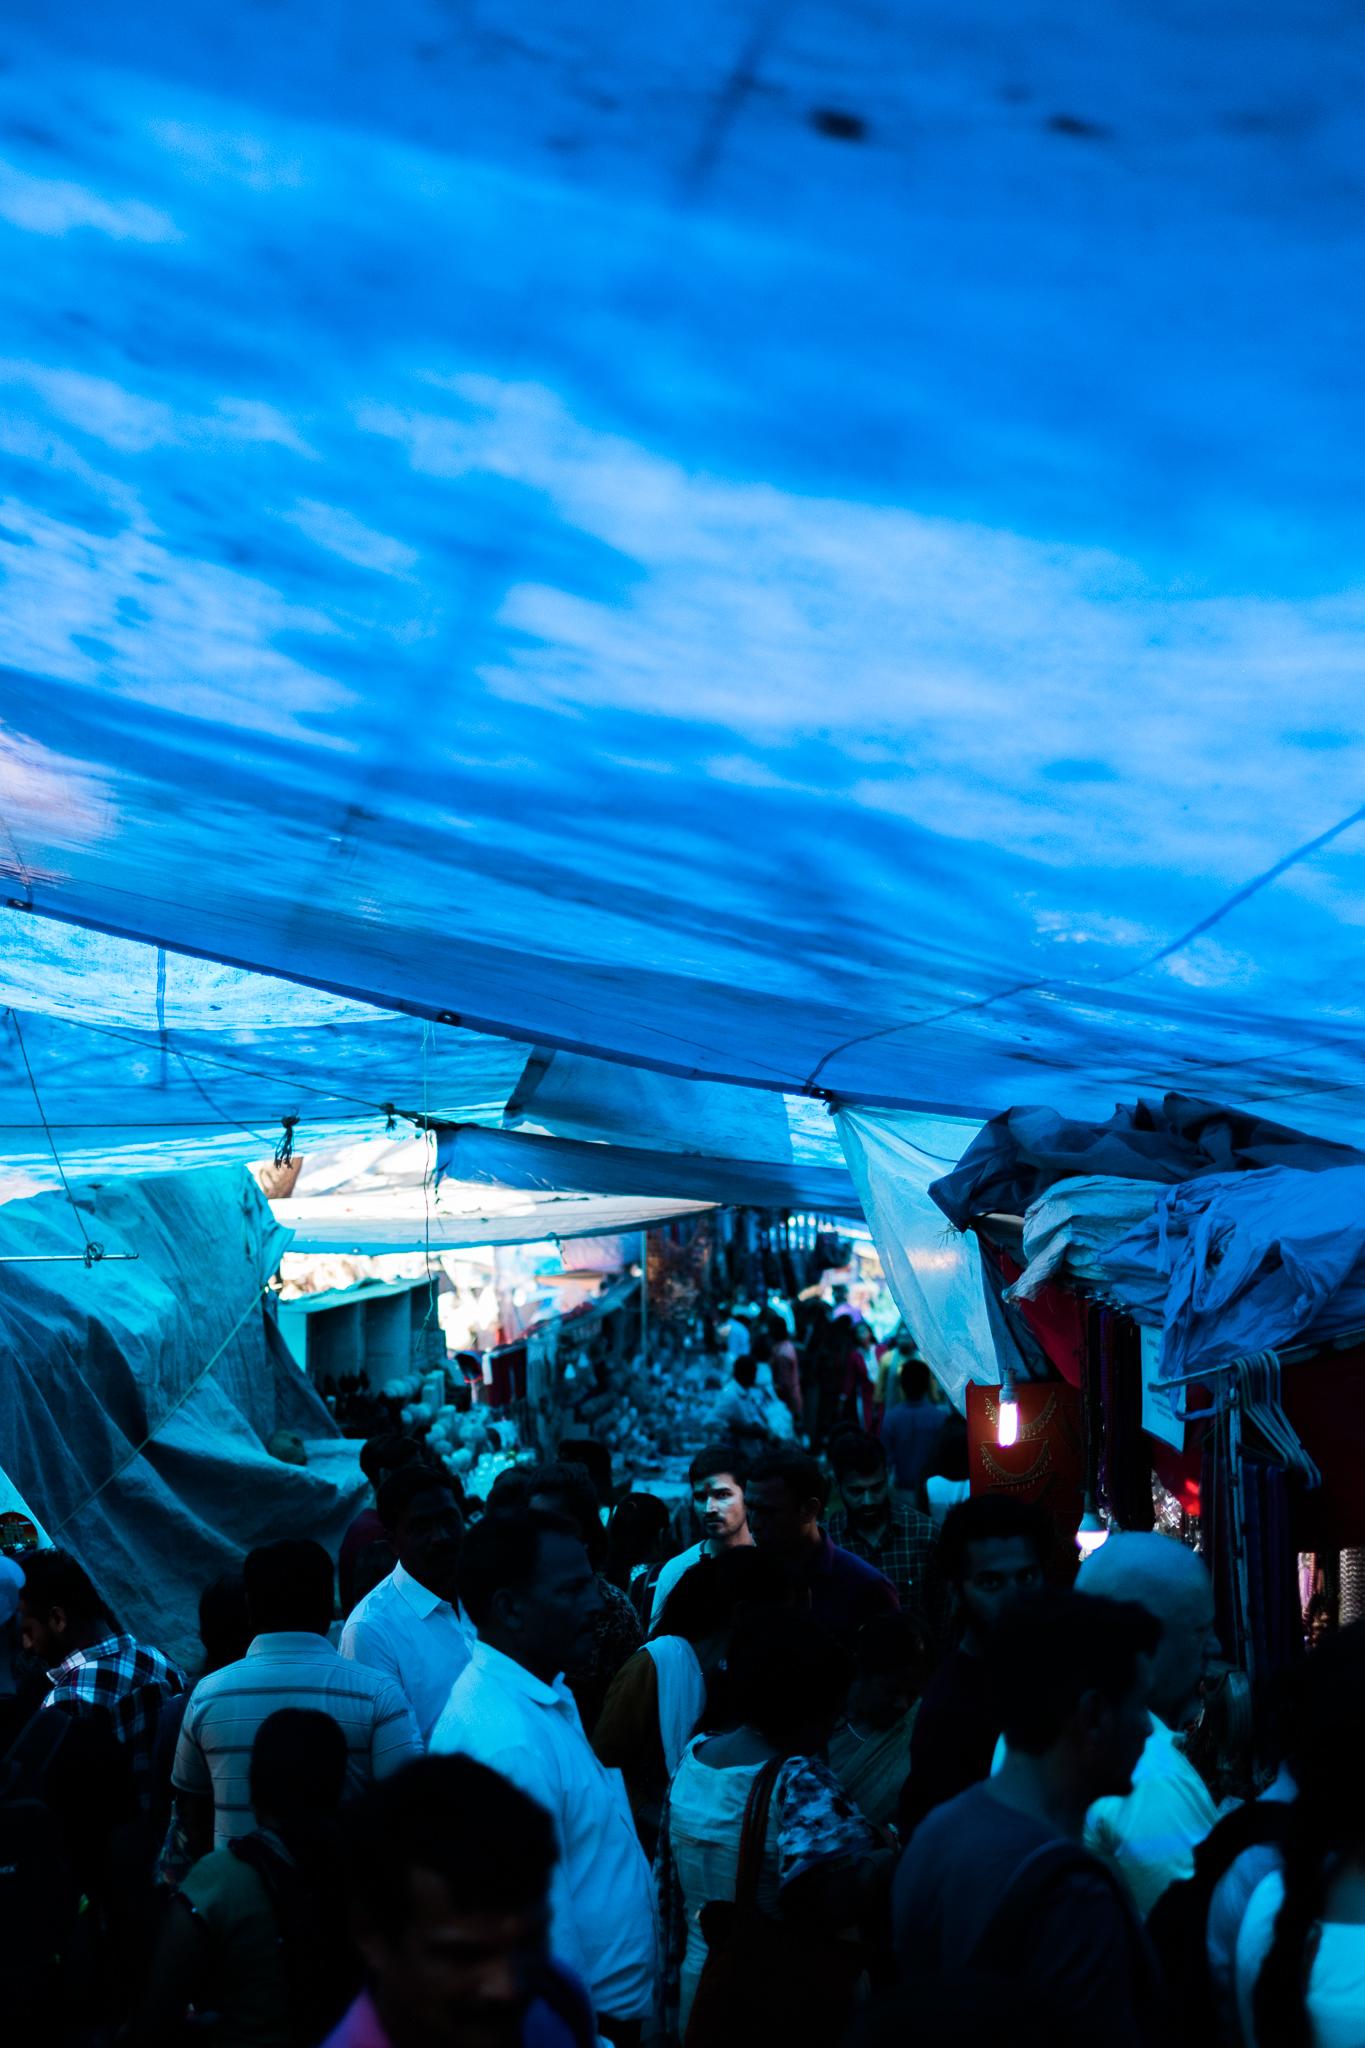 Mumbai India India Travel Street Photography (15 of 55).jpg